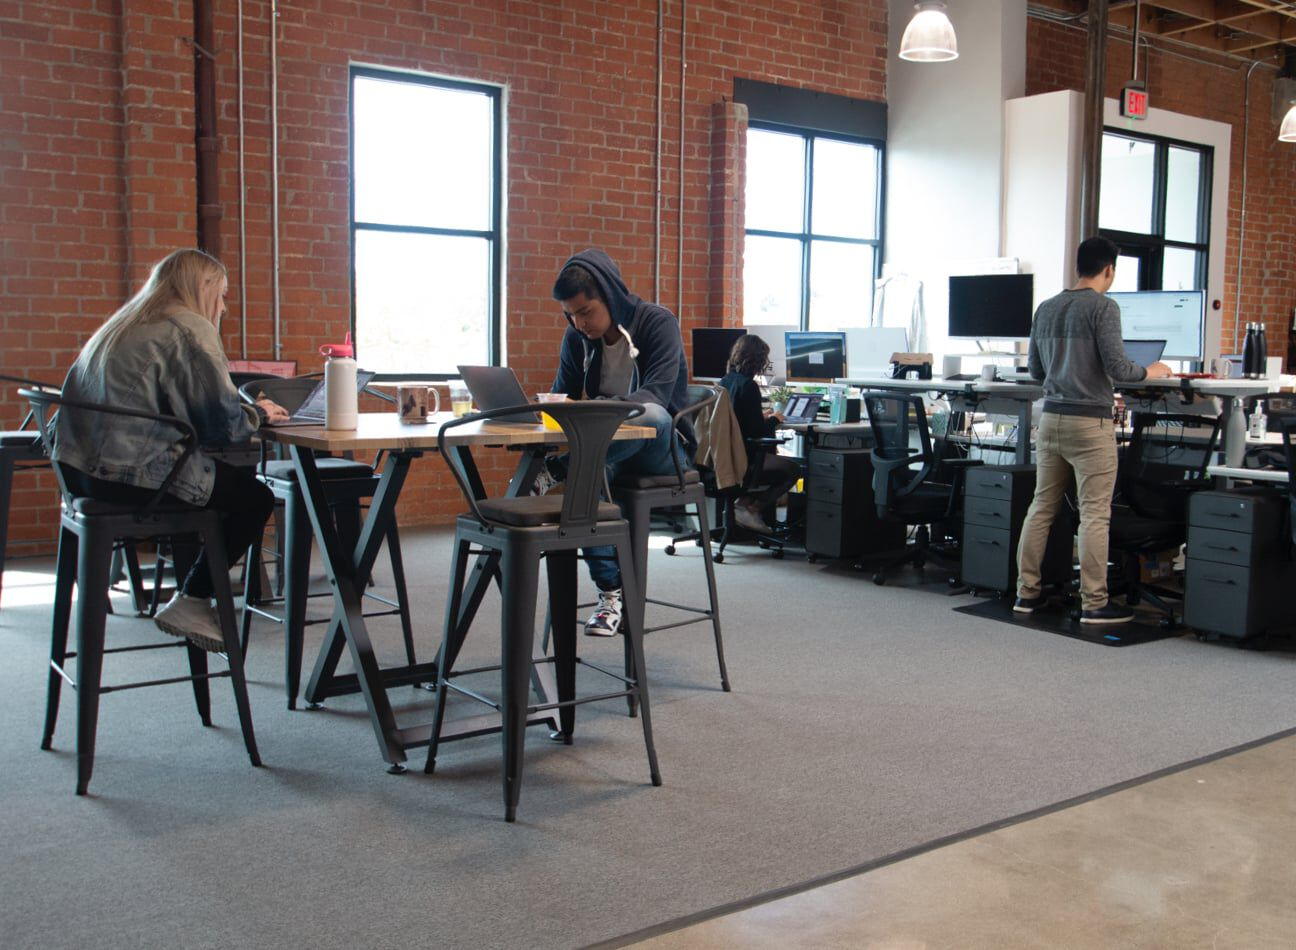 vari office furniture in use at hawke media  image